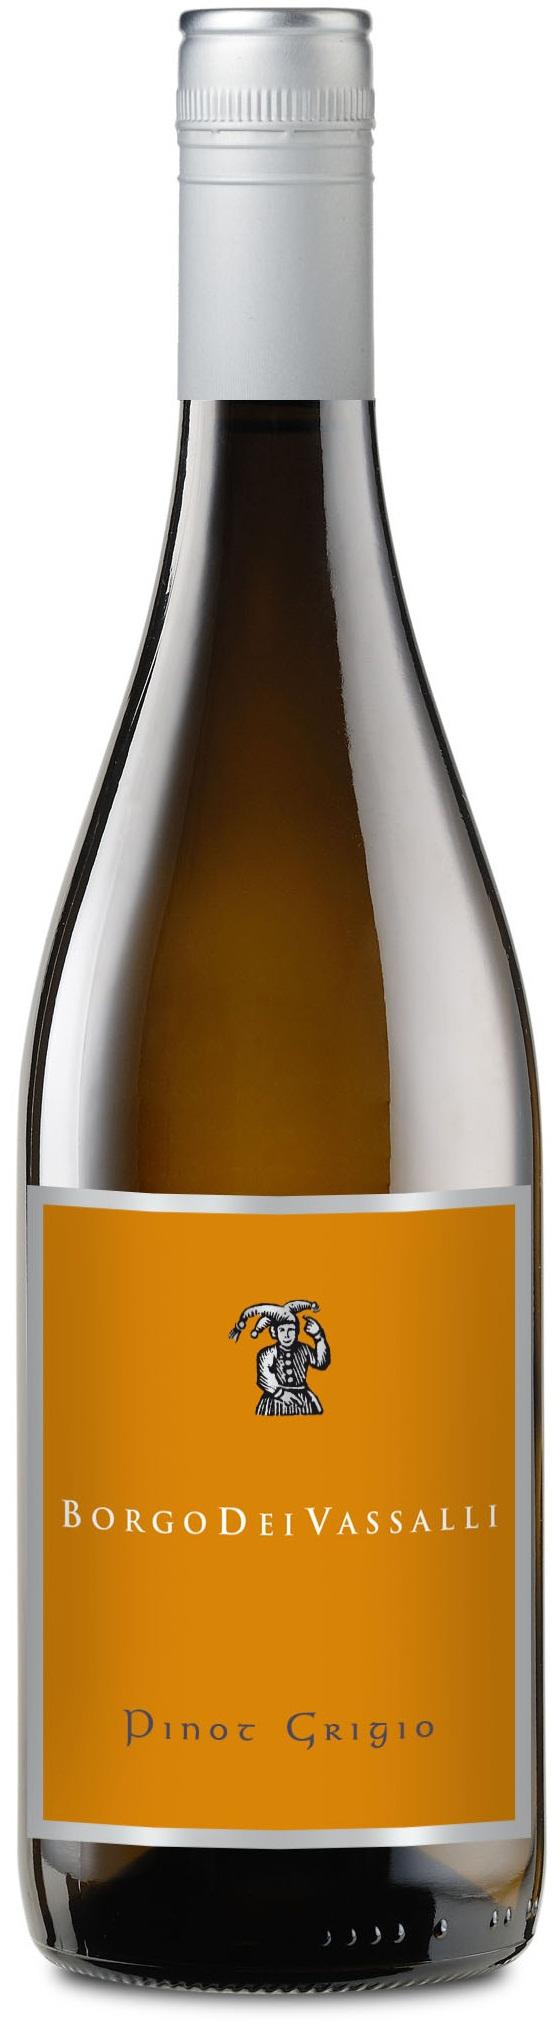 Lorenzon, `Borgo dei Vassalli` Pinot Grigio 2016